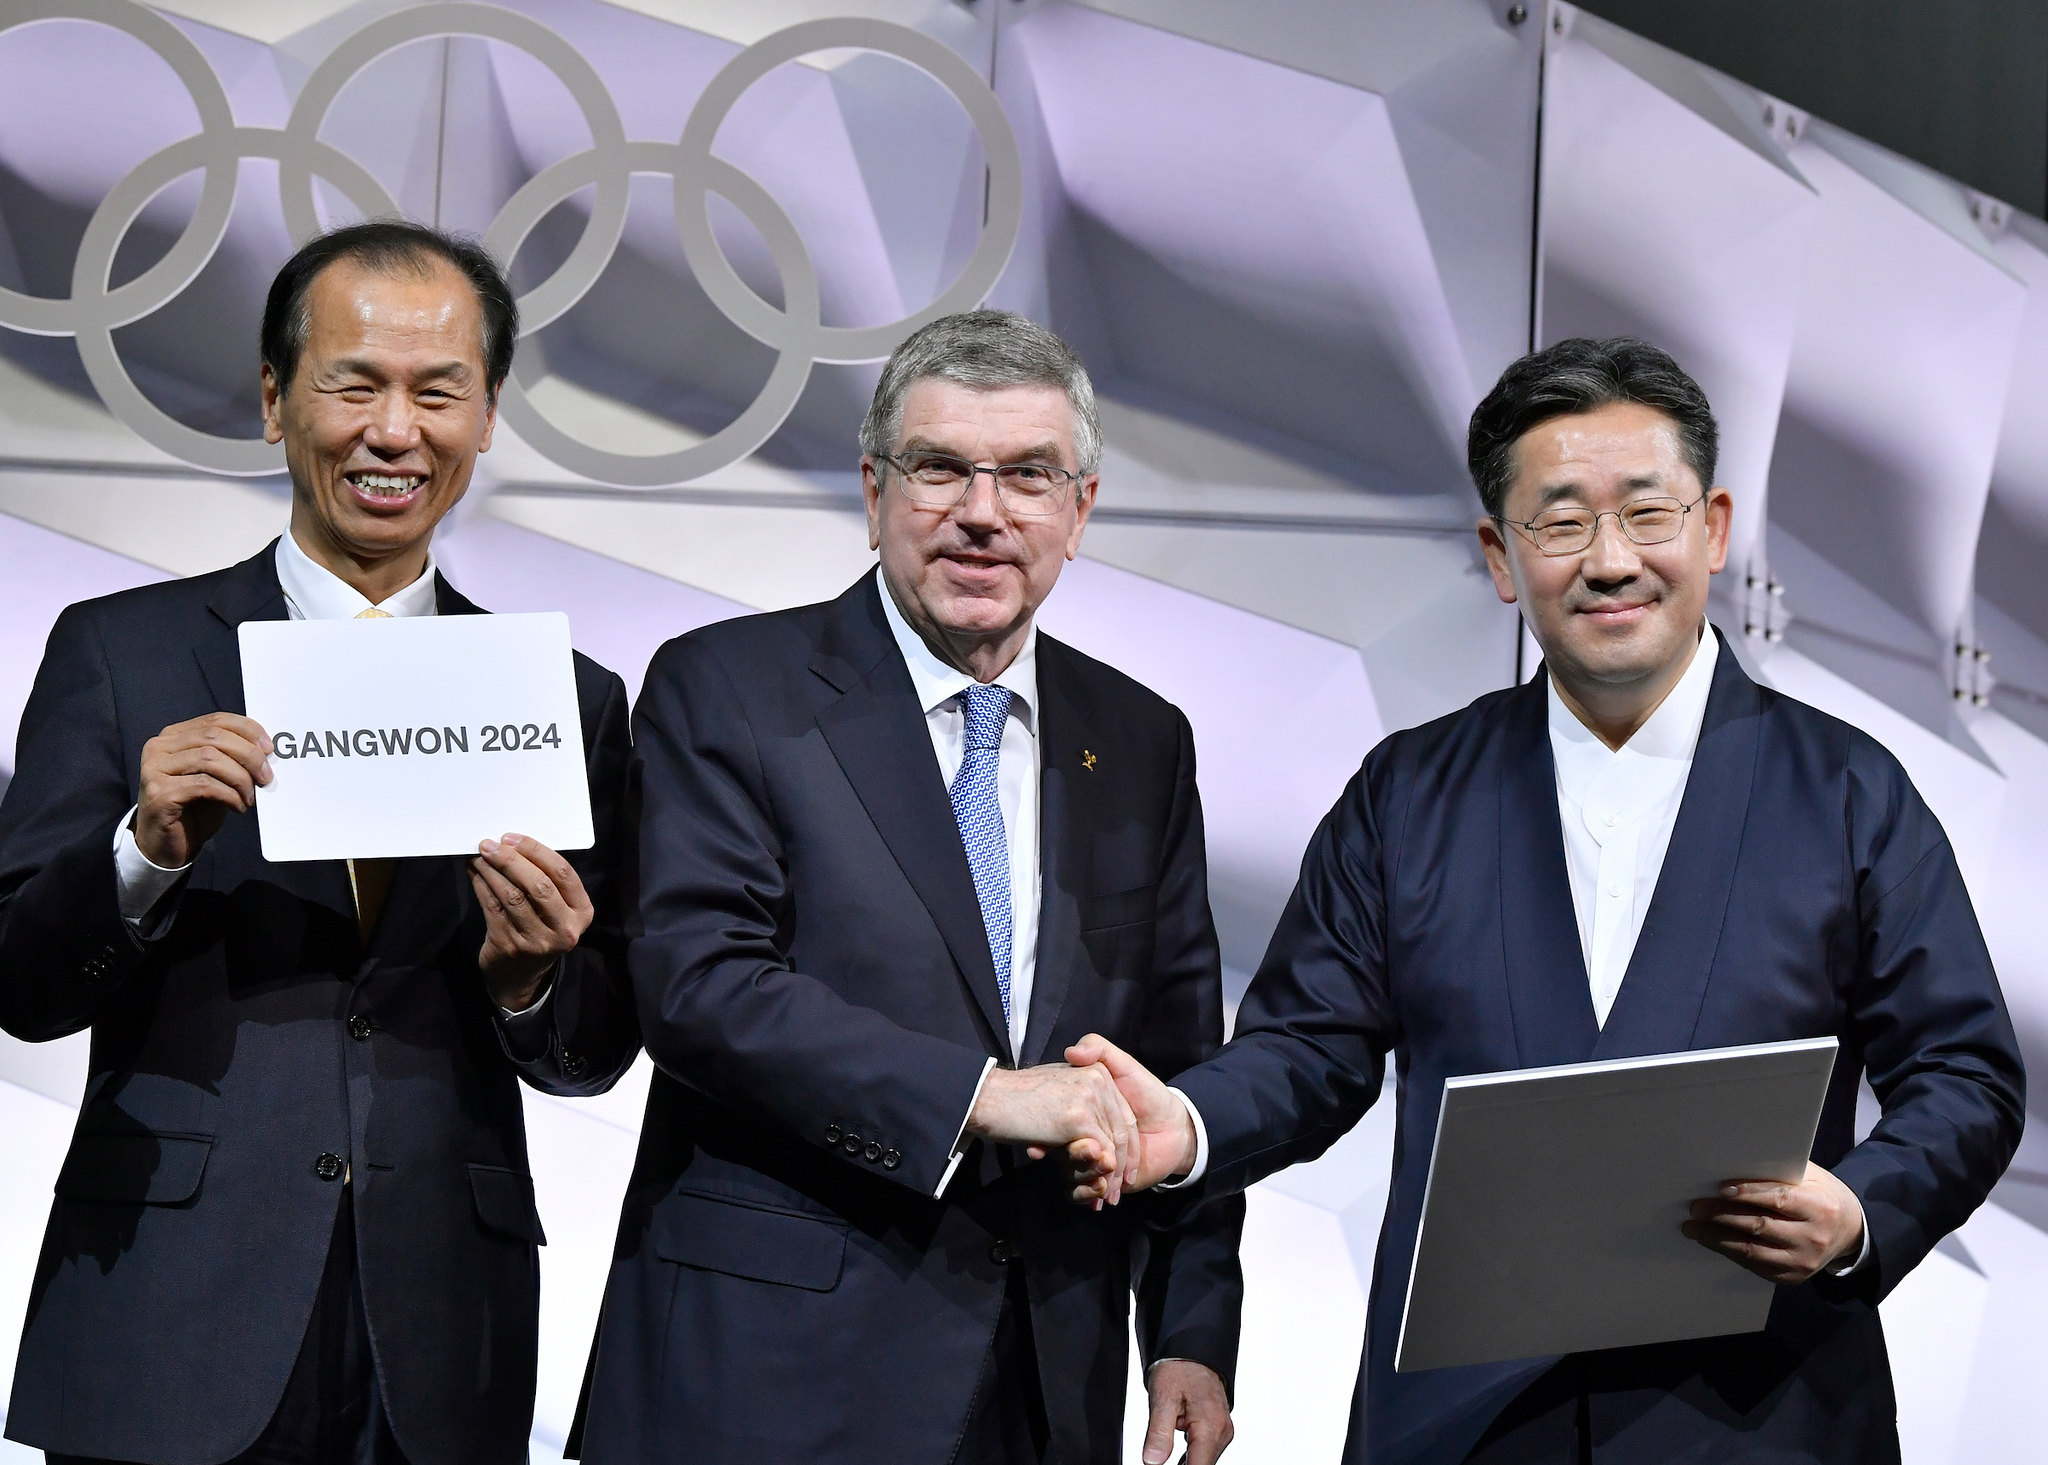 IOC President Thomas Bach during the 135th IOC Session